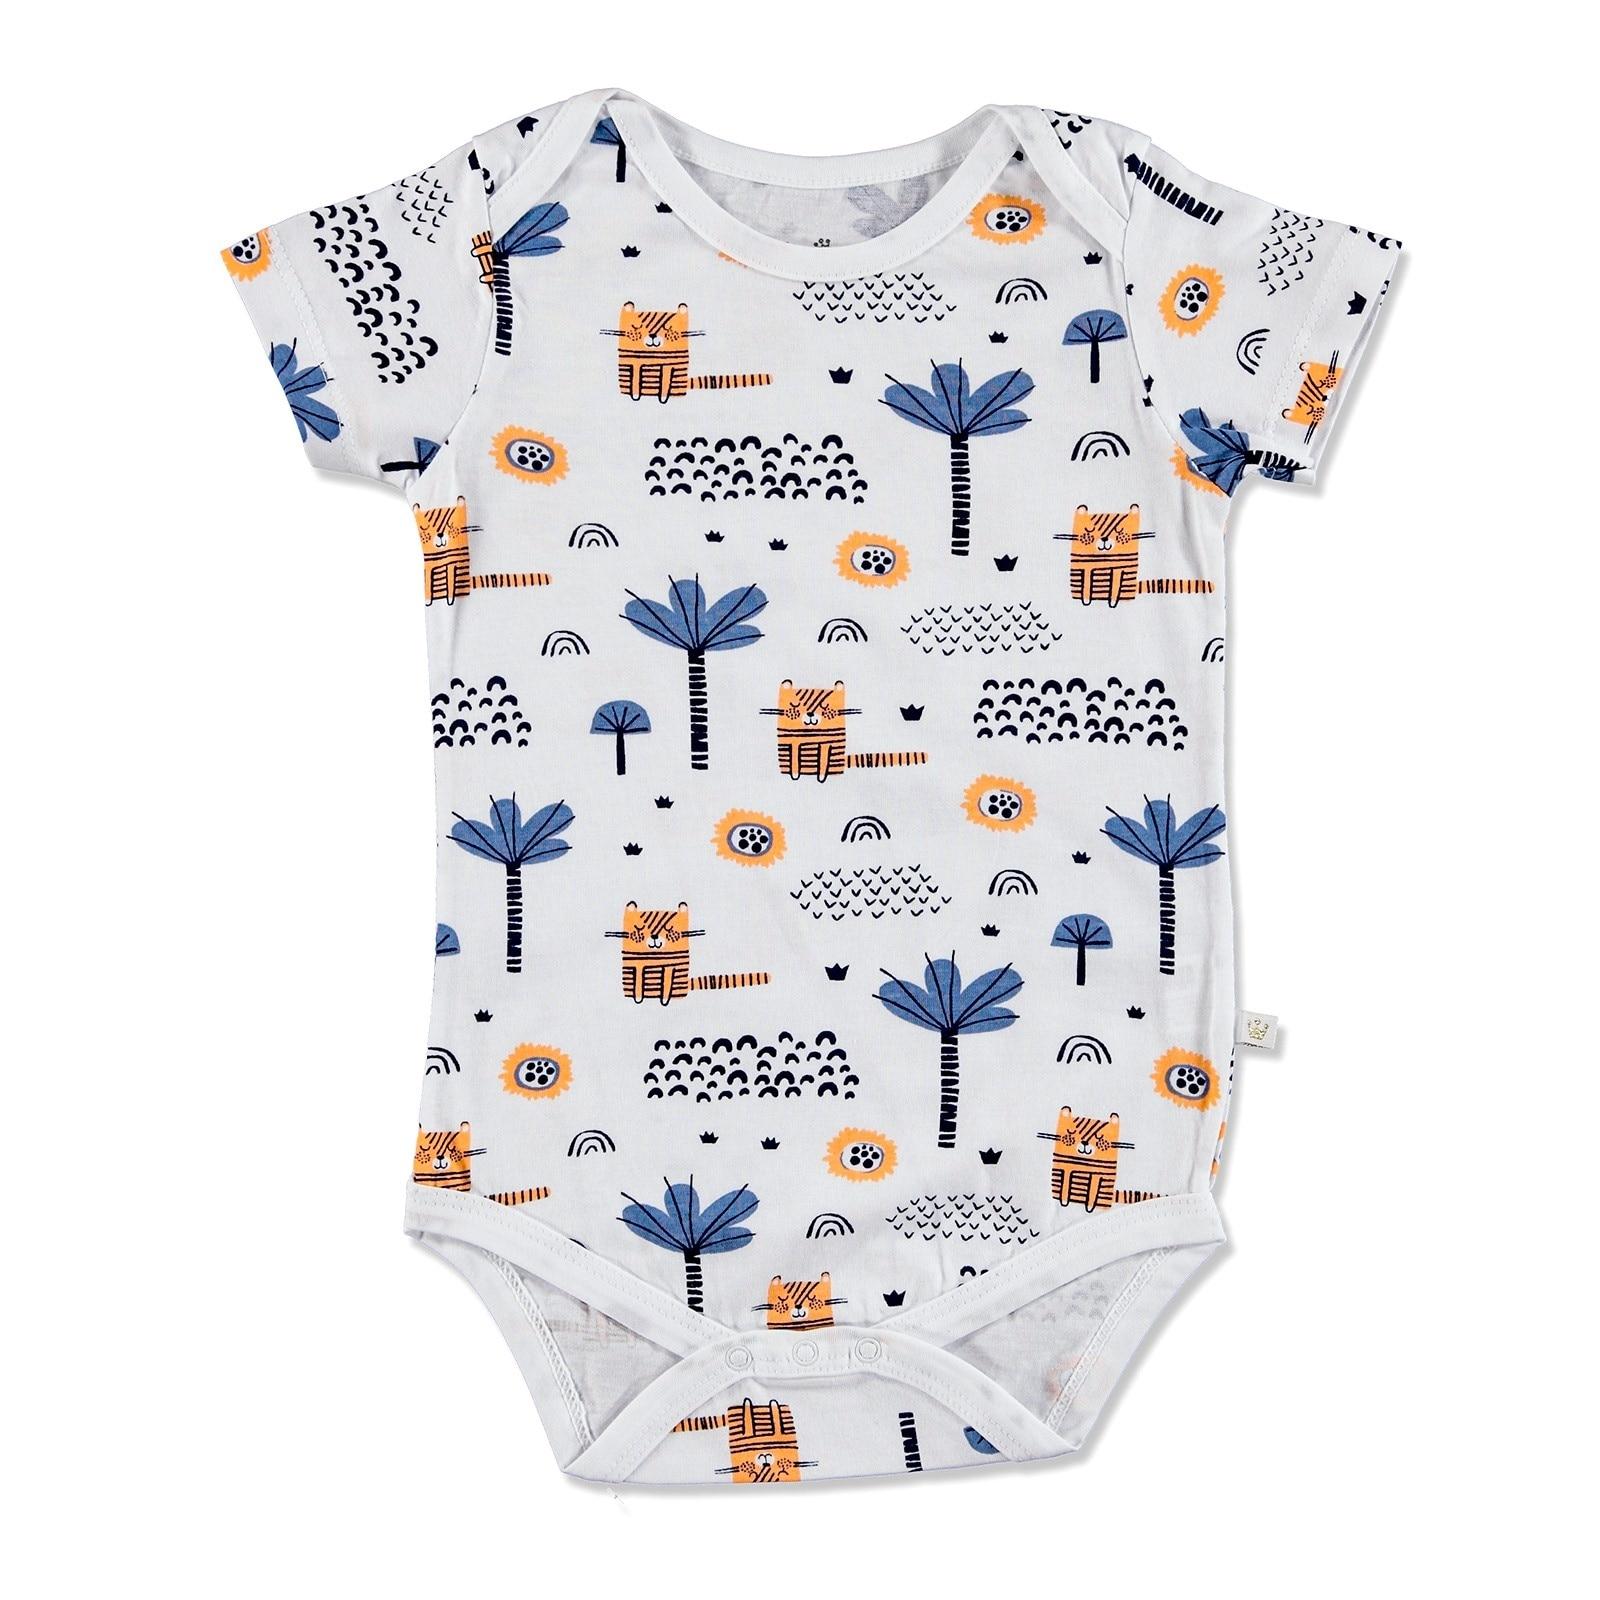 2 Cute Little Blue Short Sleeve Bodysuits Size 12-18 Months